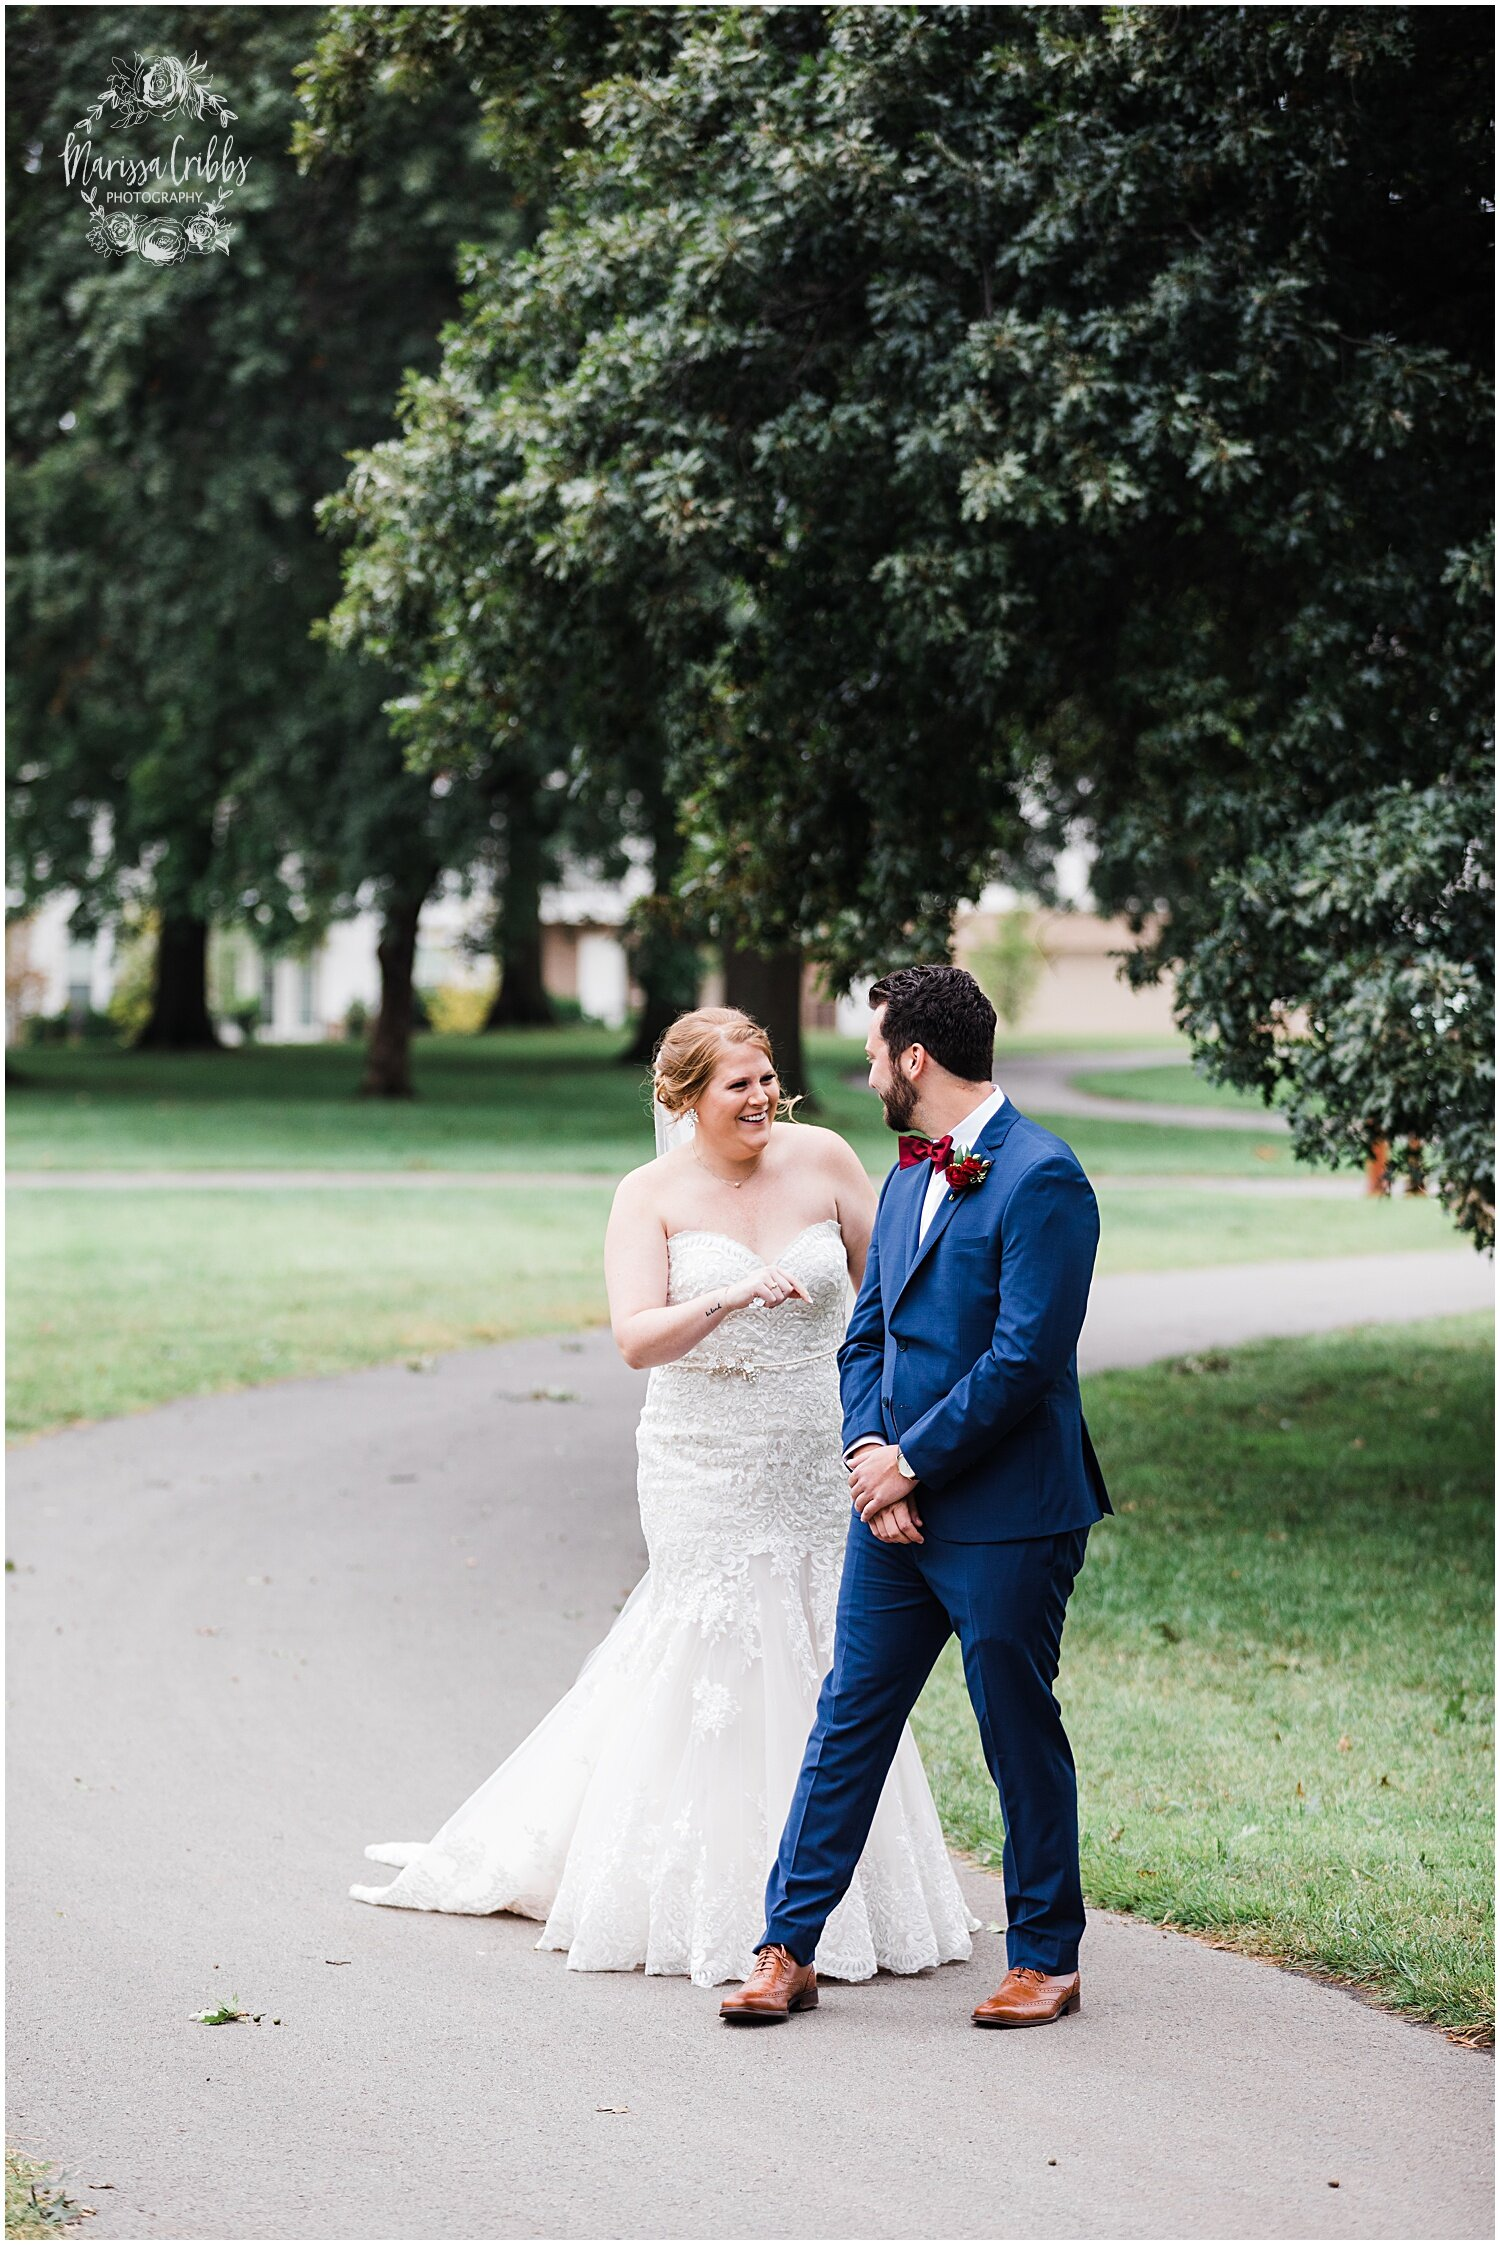 ANNA & LUKE MARRIED BLOG | MARISSA CRIBBS PHOTOGRAPHY | WESTON RED BARN FARM_9367.jpg